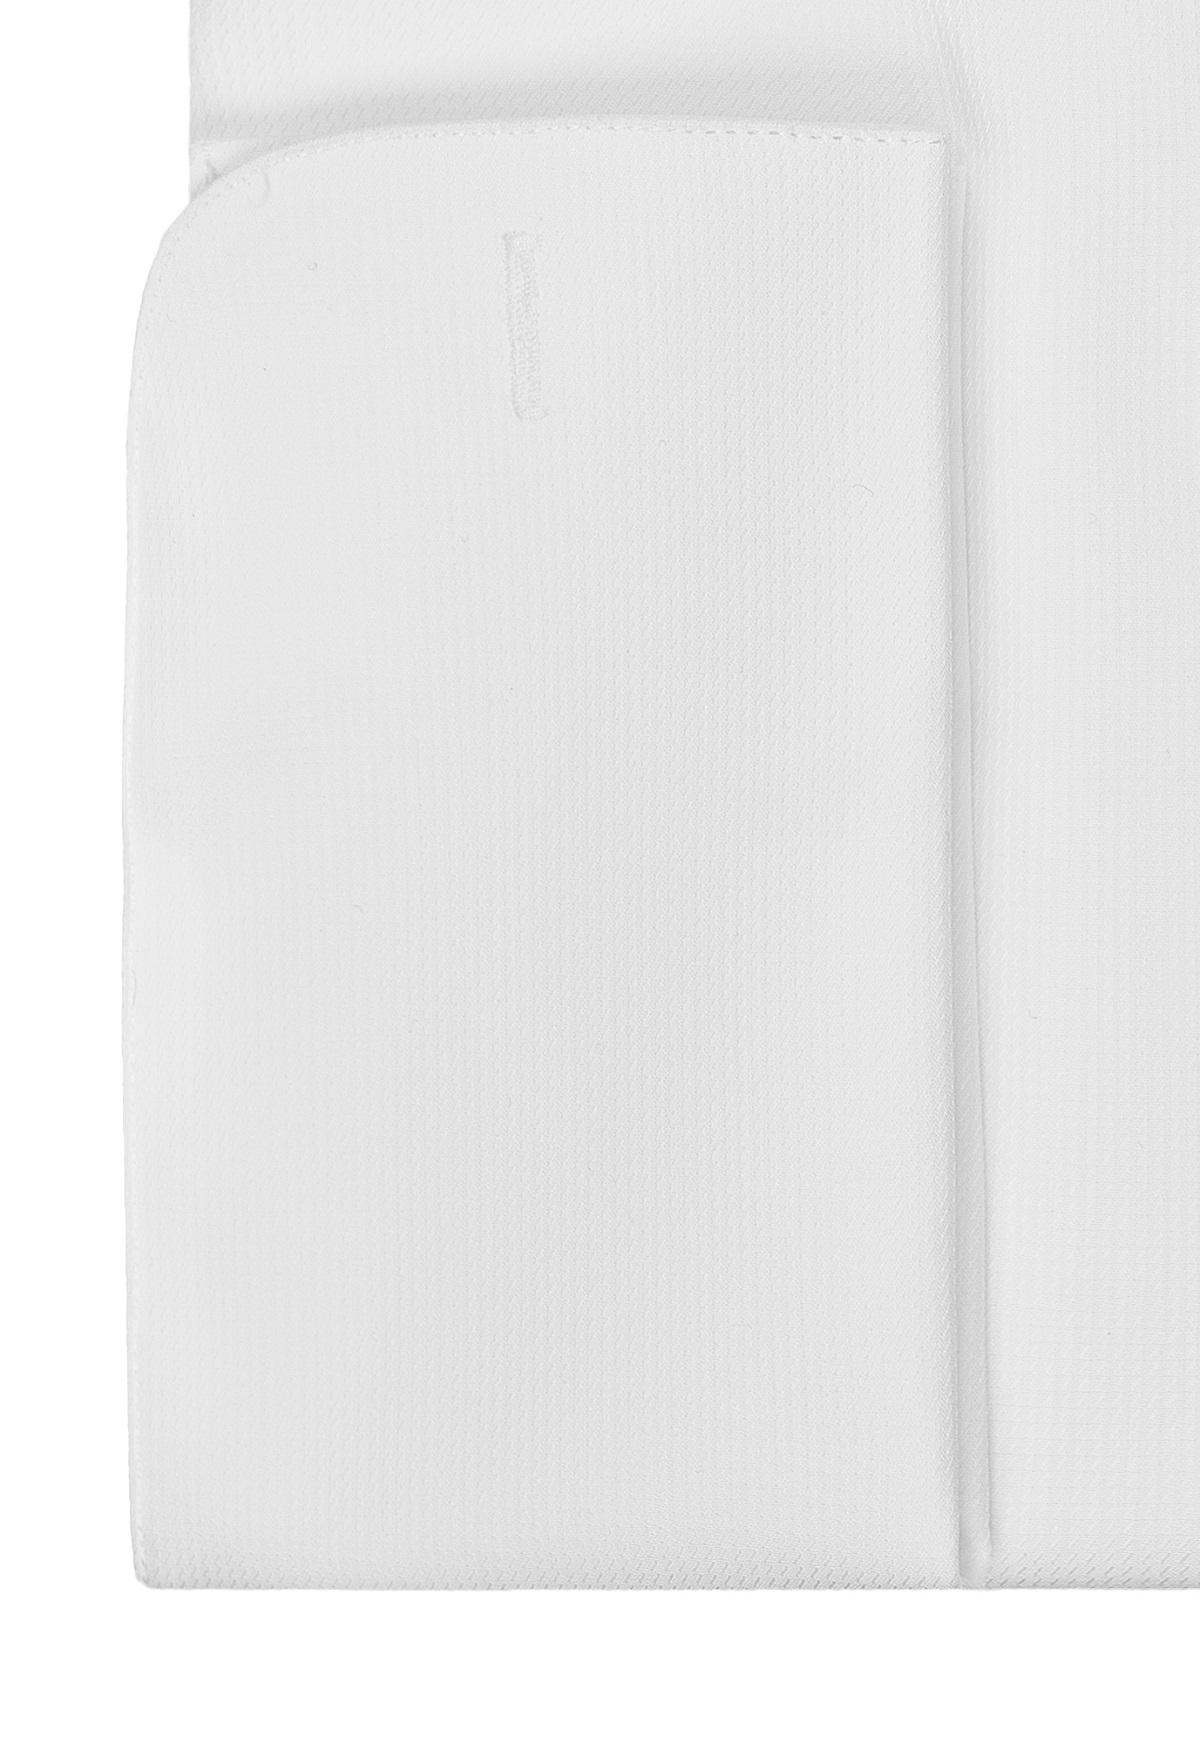 Chris White Dress Shirt - Double Cuff